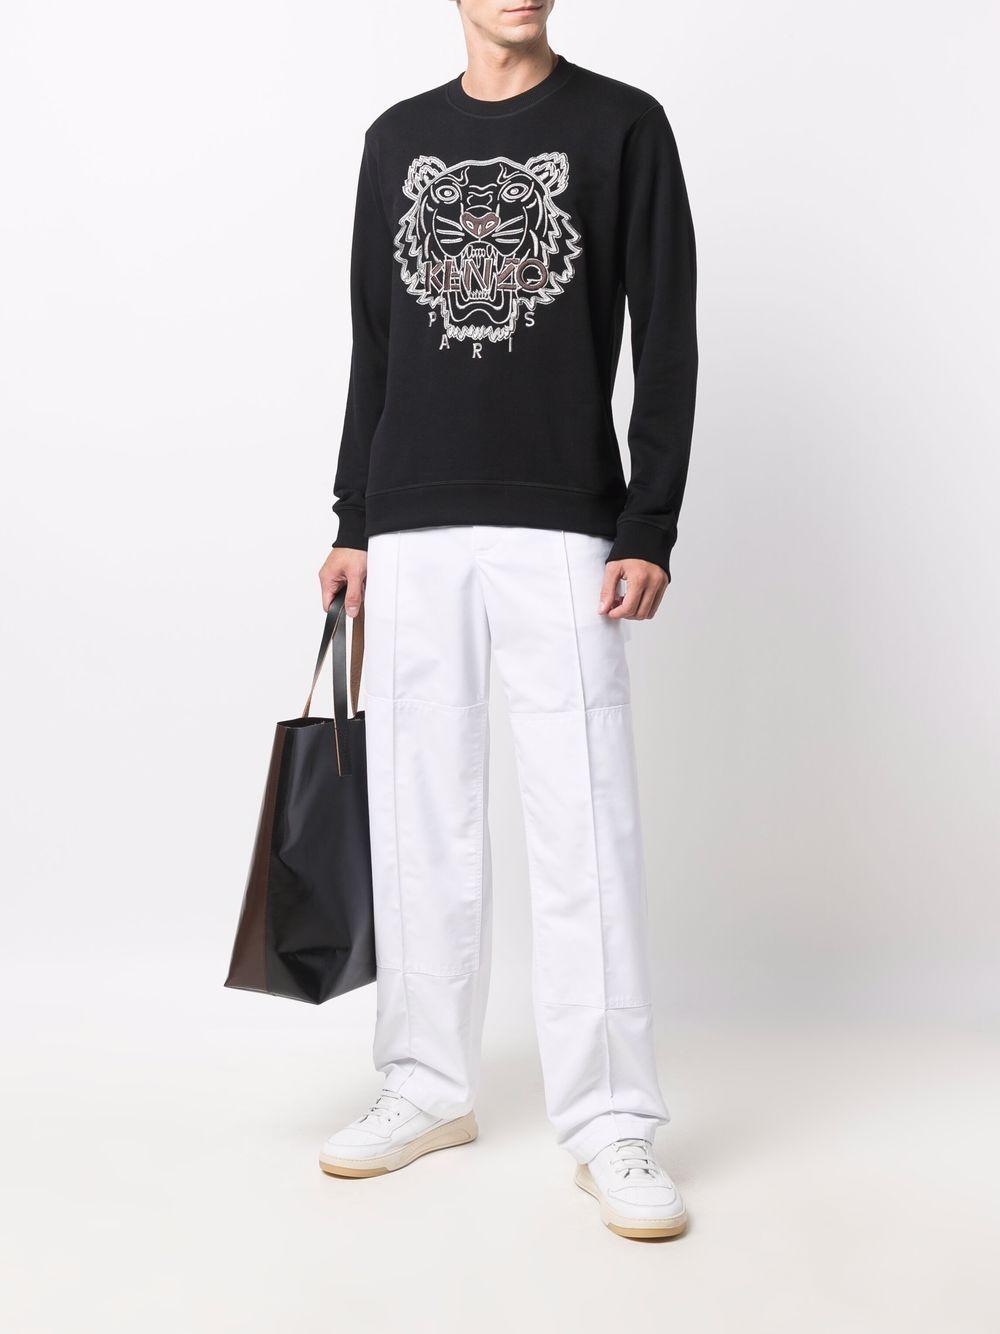 sweatshirt with embroidery man black in cotton KENZO | Sweatshirts | FB65SW1244XF99